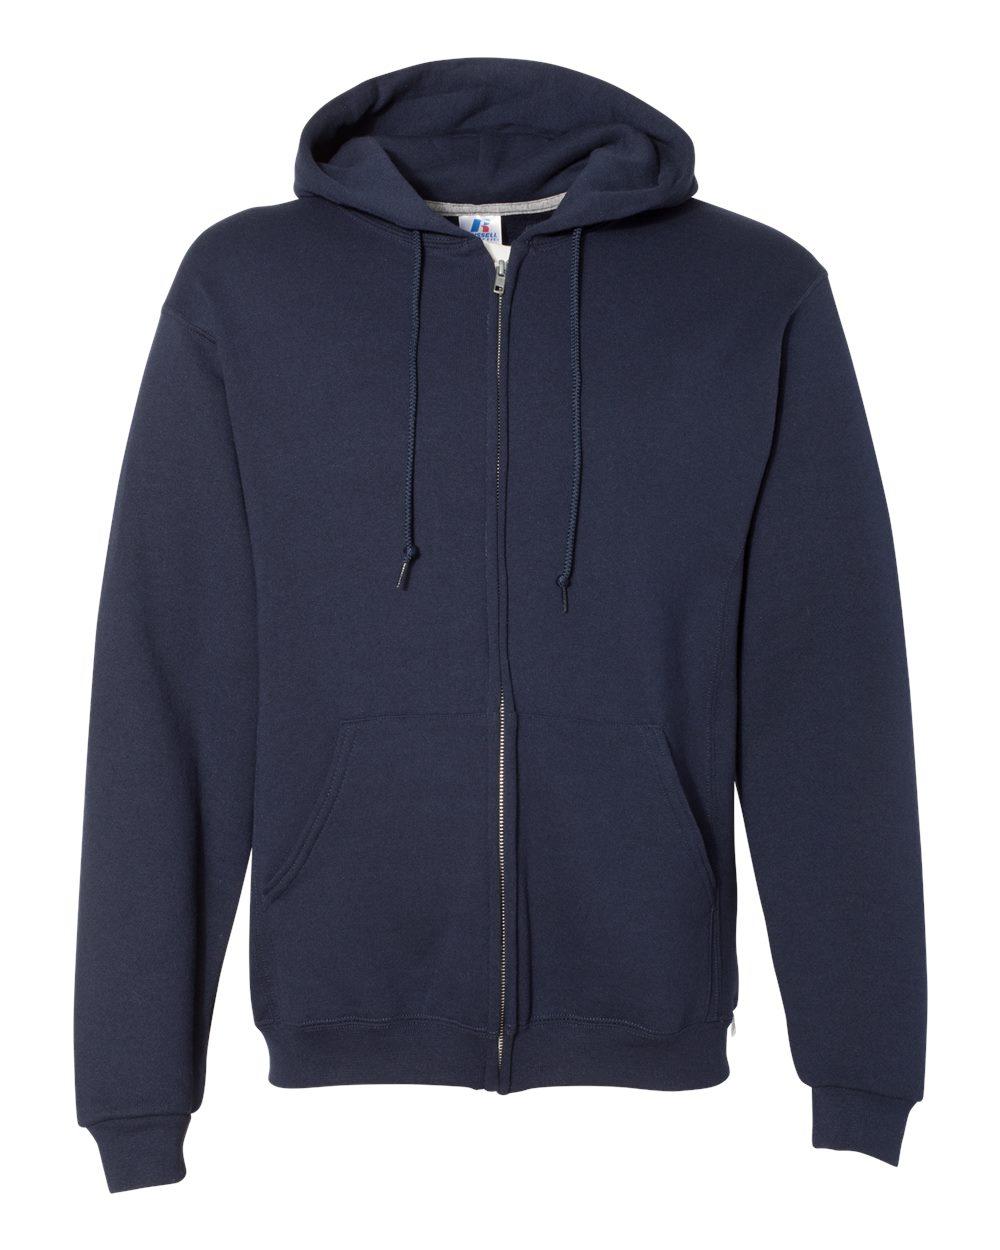 Russell-Athletic-Blank-Plain-Hooded-Full-Zip-Sweatshirt-697HBM-up-to-3XL thumbnail 9